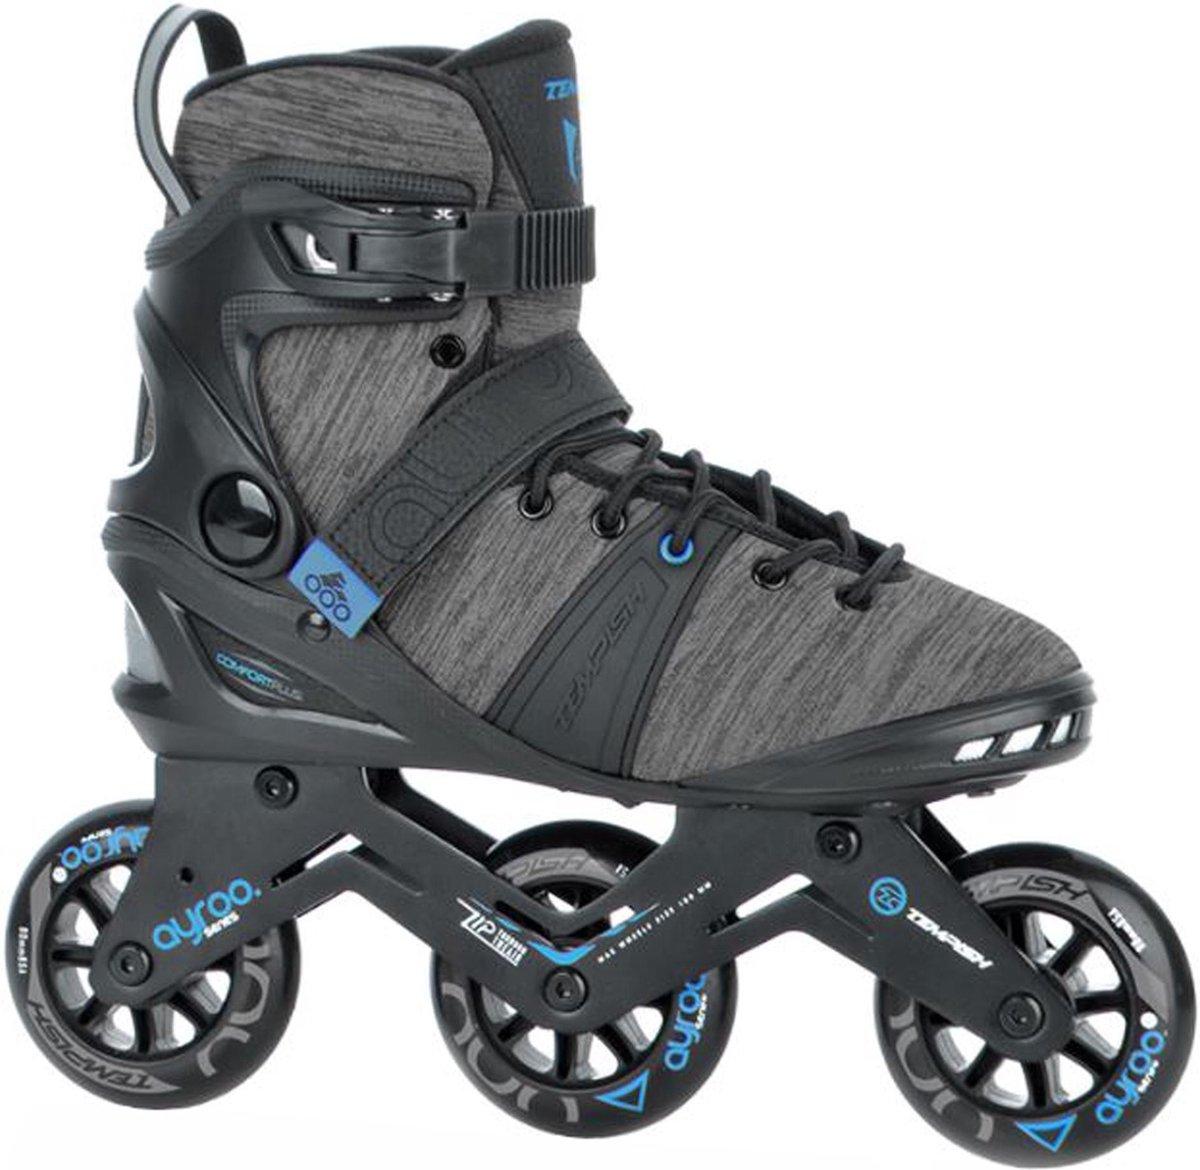 Tempish Ayroo 90 Inlineskates - Maat 44 - Unisex - zwart - grijs - blauw